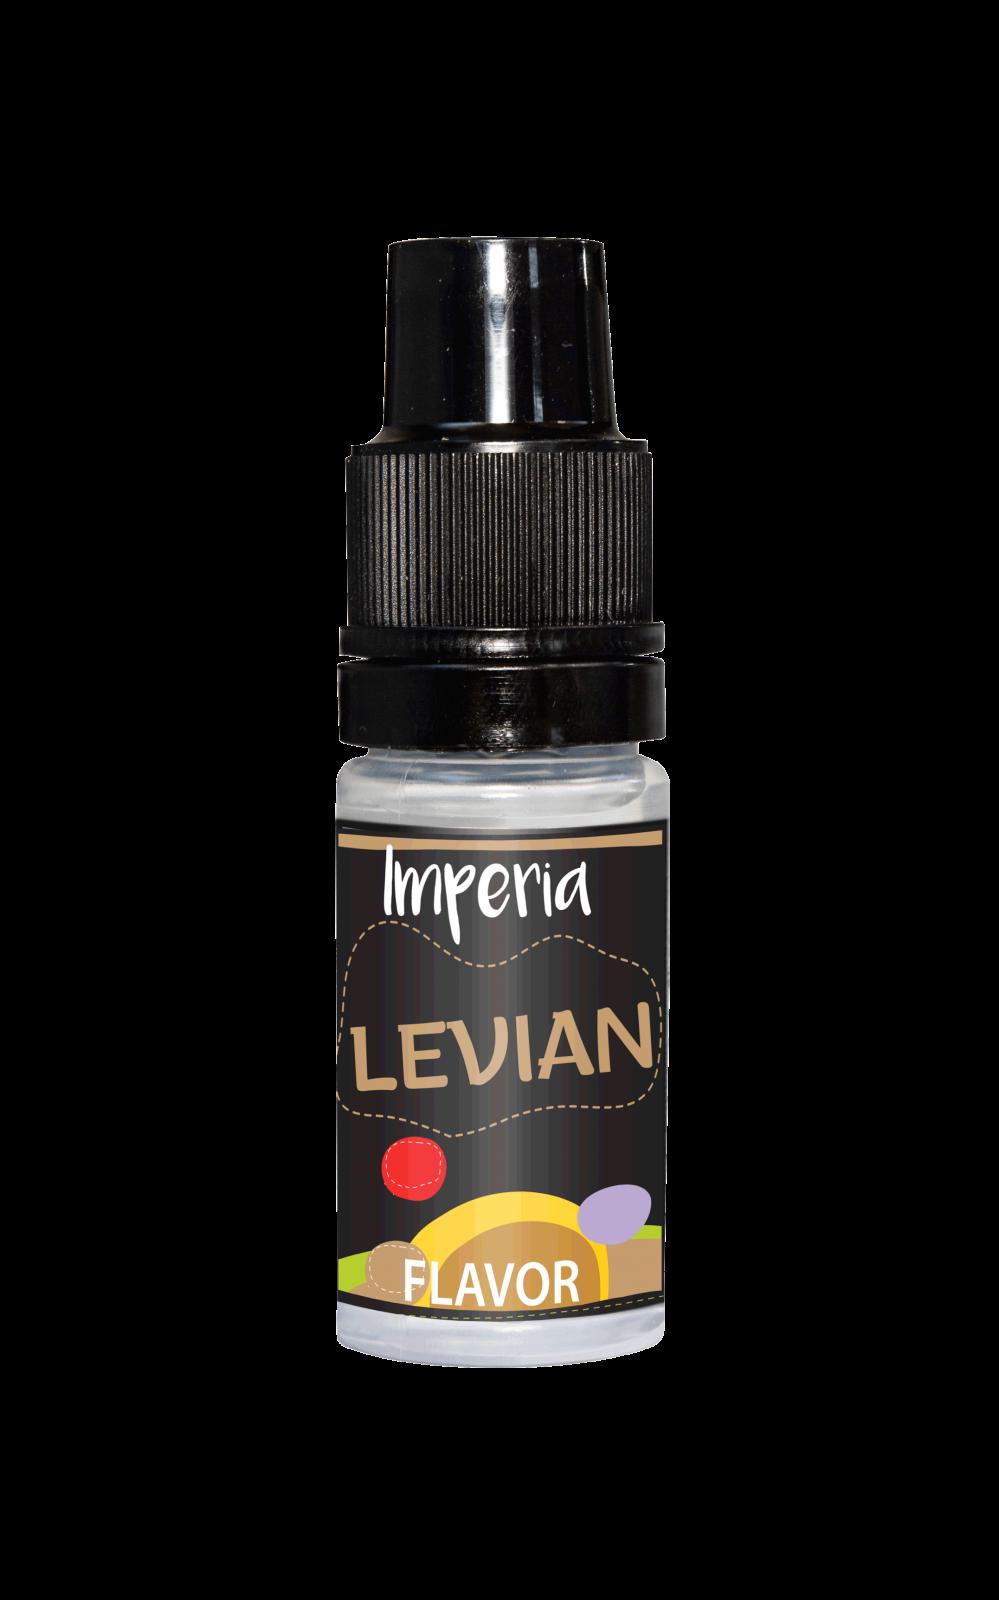 LEVIAN - Aroma Imperia Black Label 10 ml Boudoir Samadhi s.r.o.